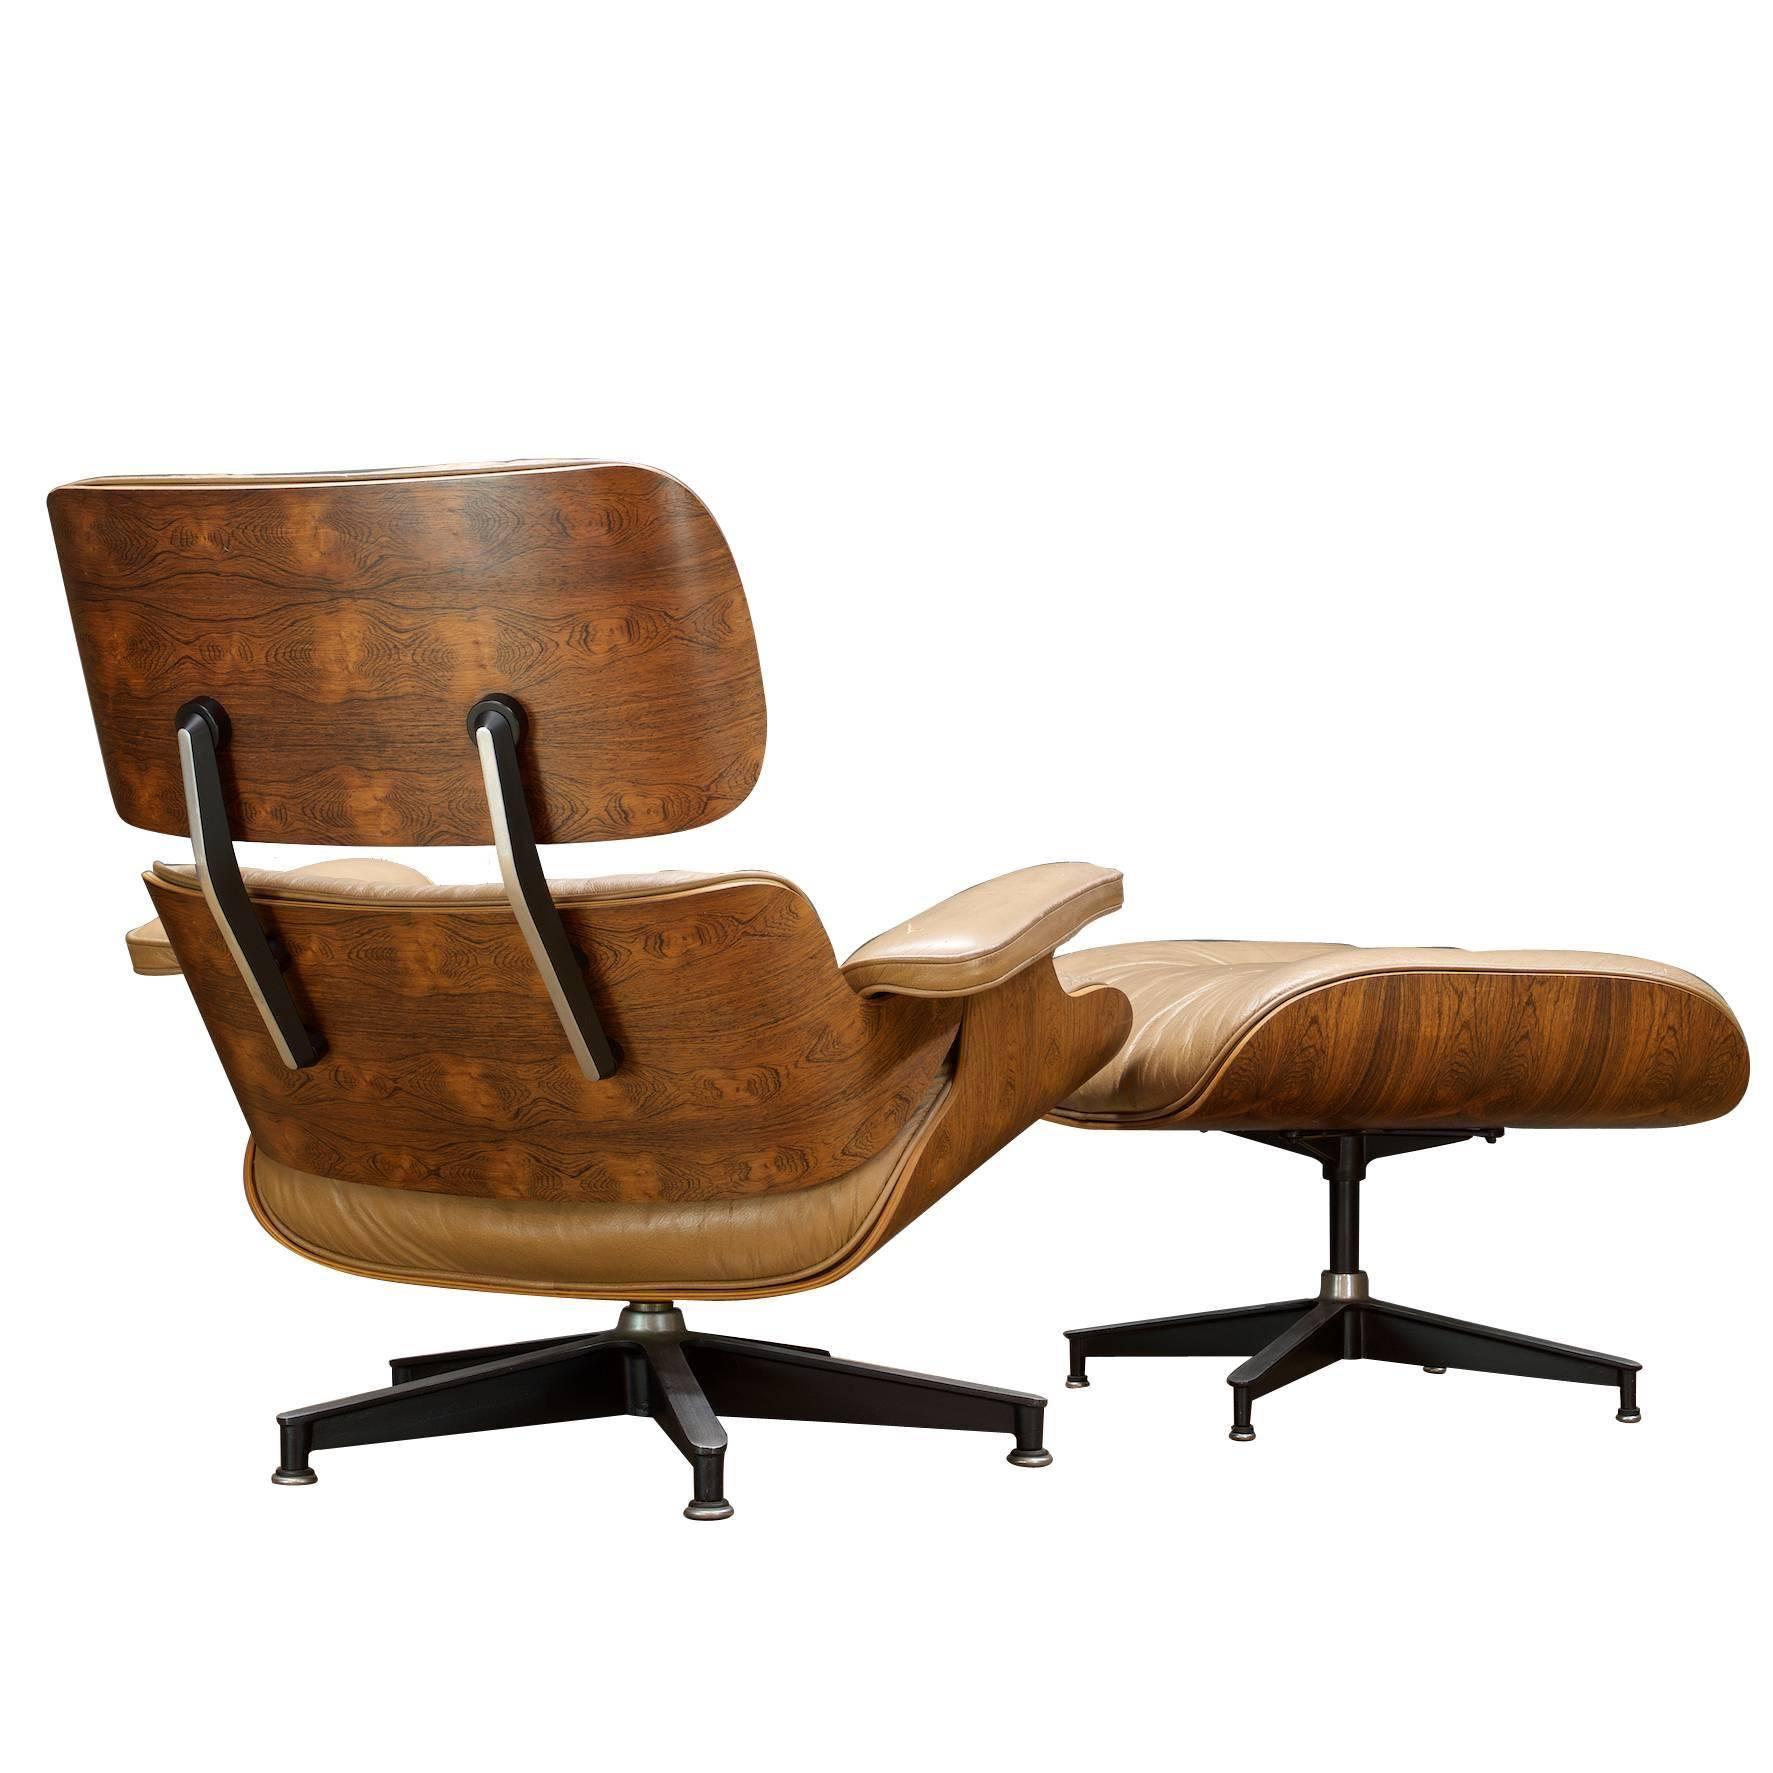 eames herman miller 670 lounge chair2 org master